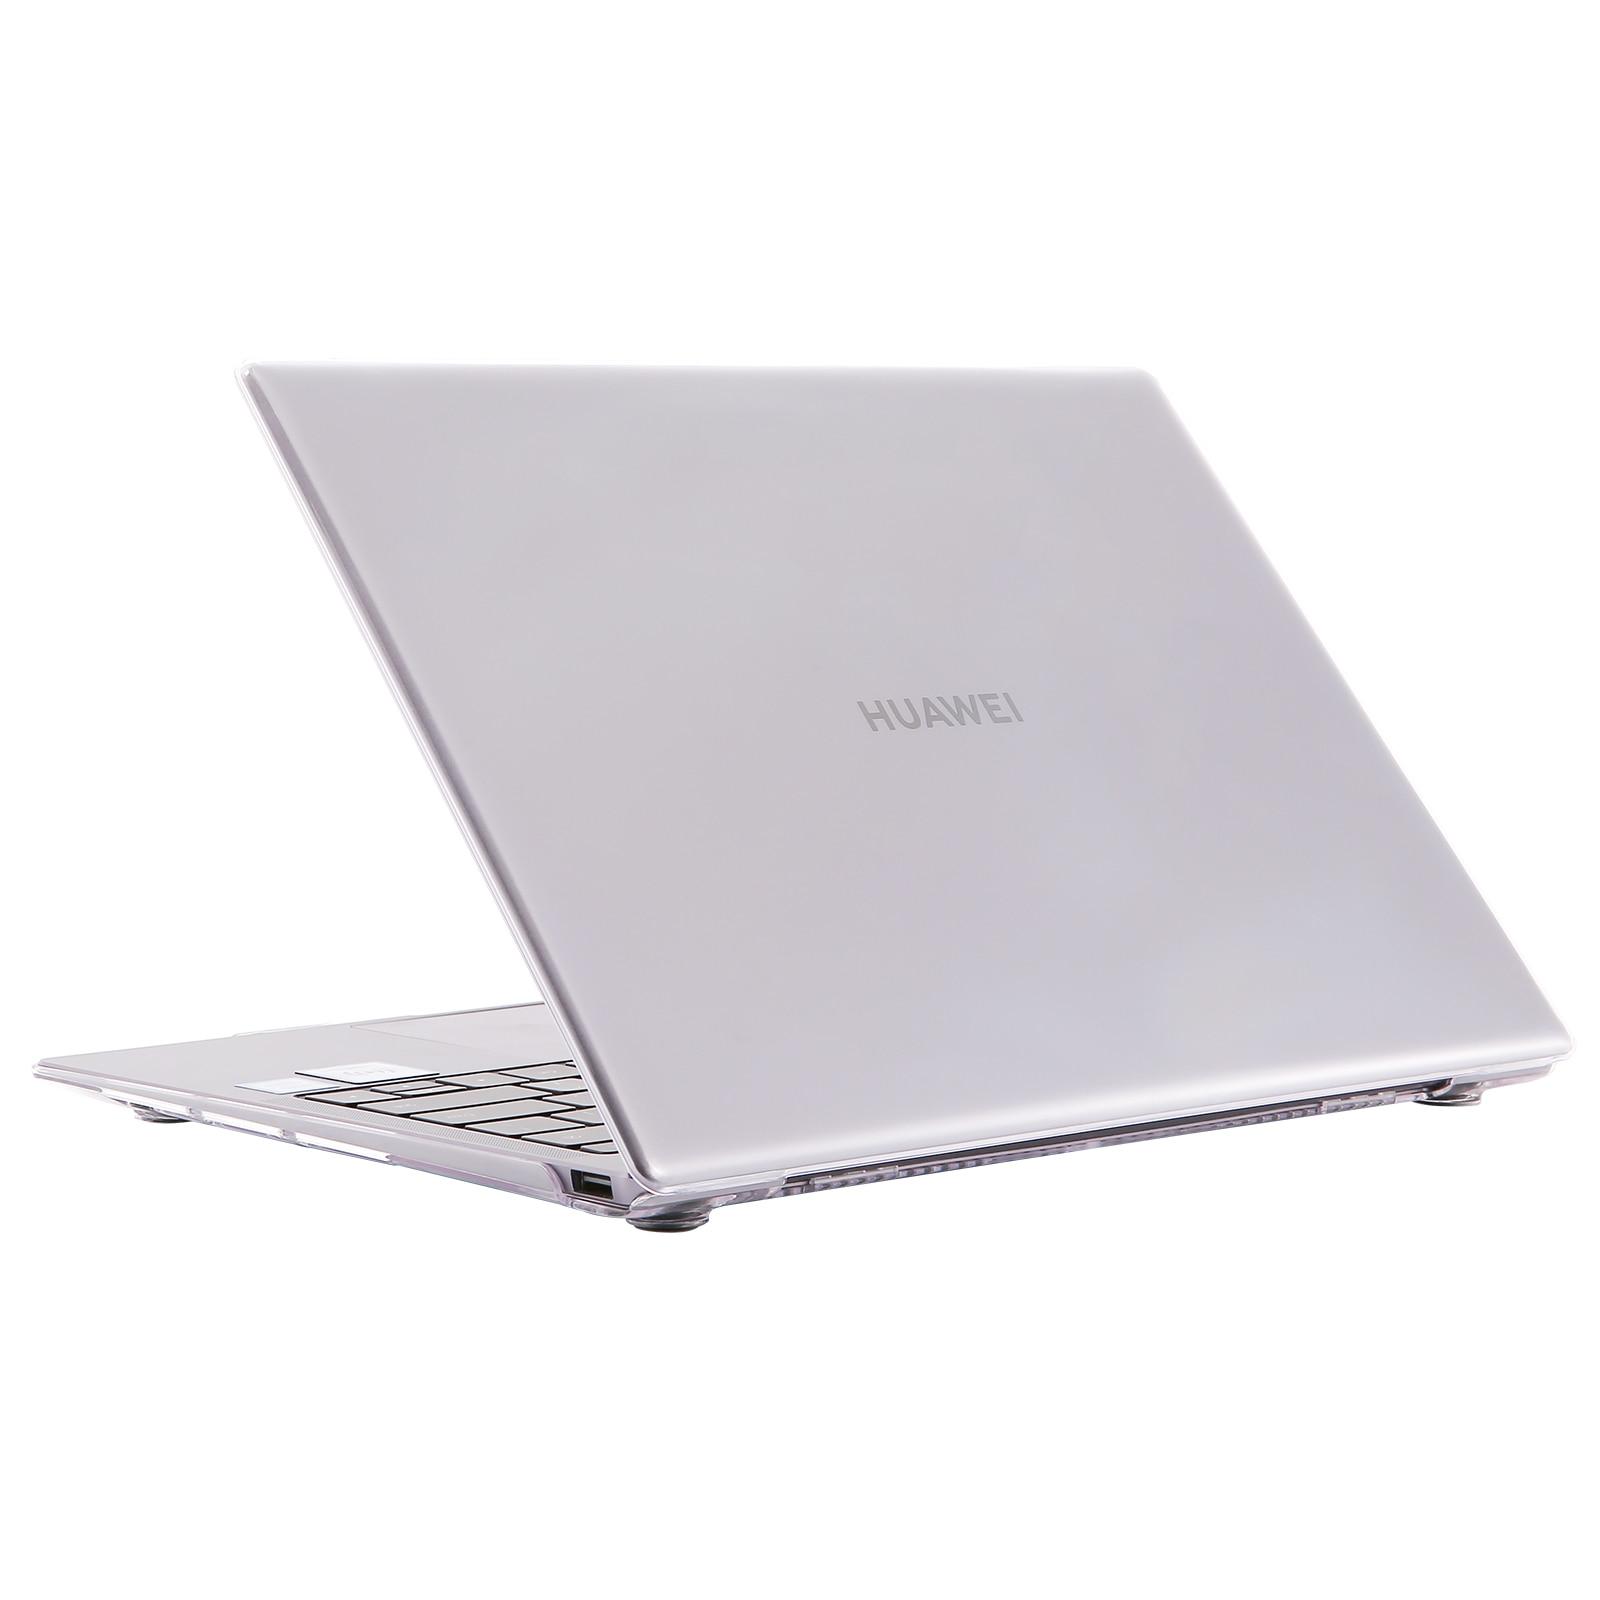 Cheap Bolsas e estojos p laptop